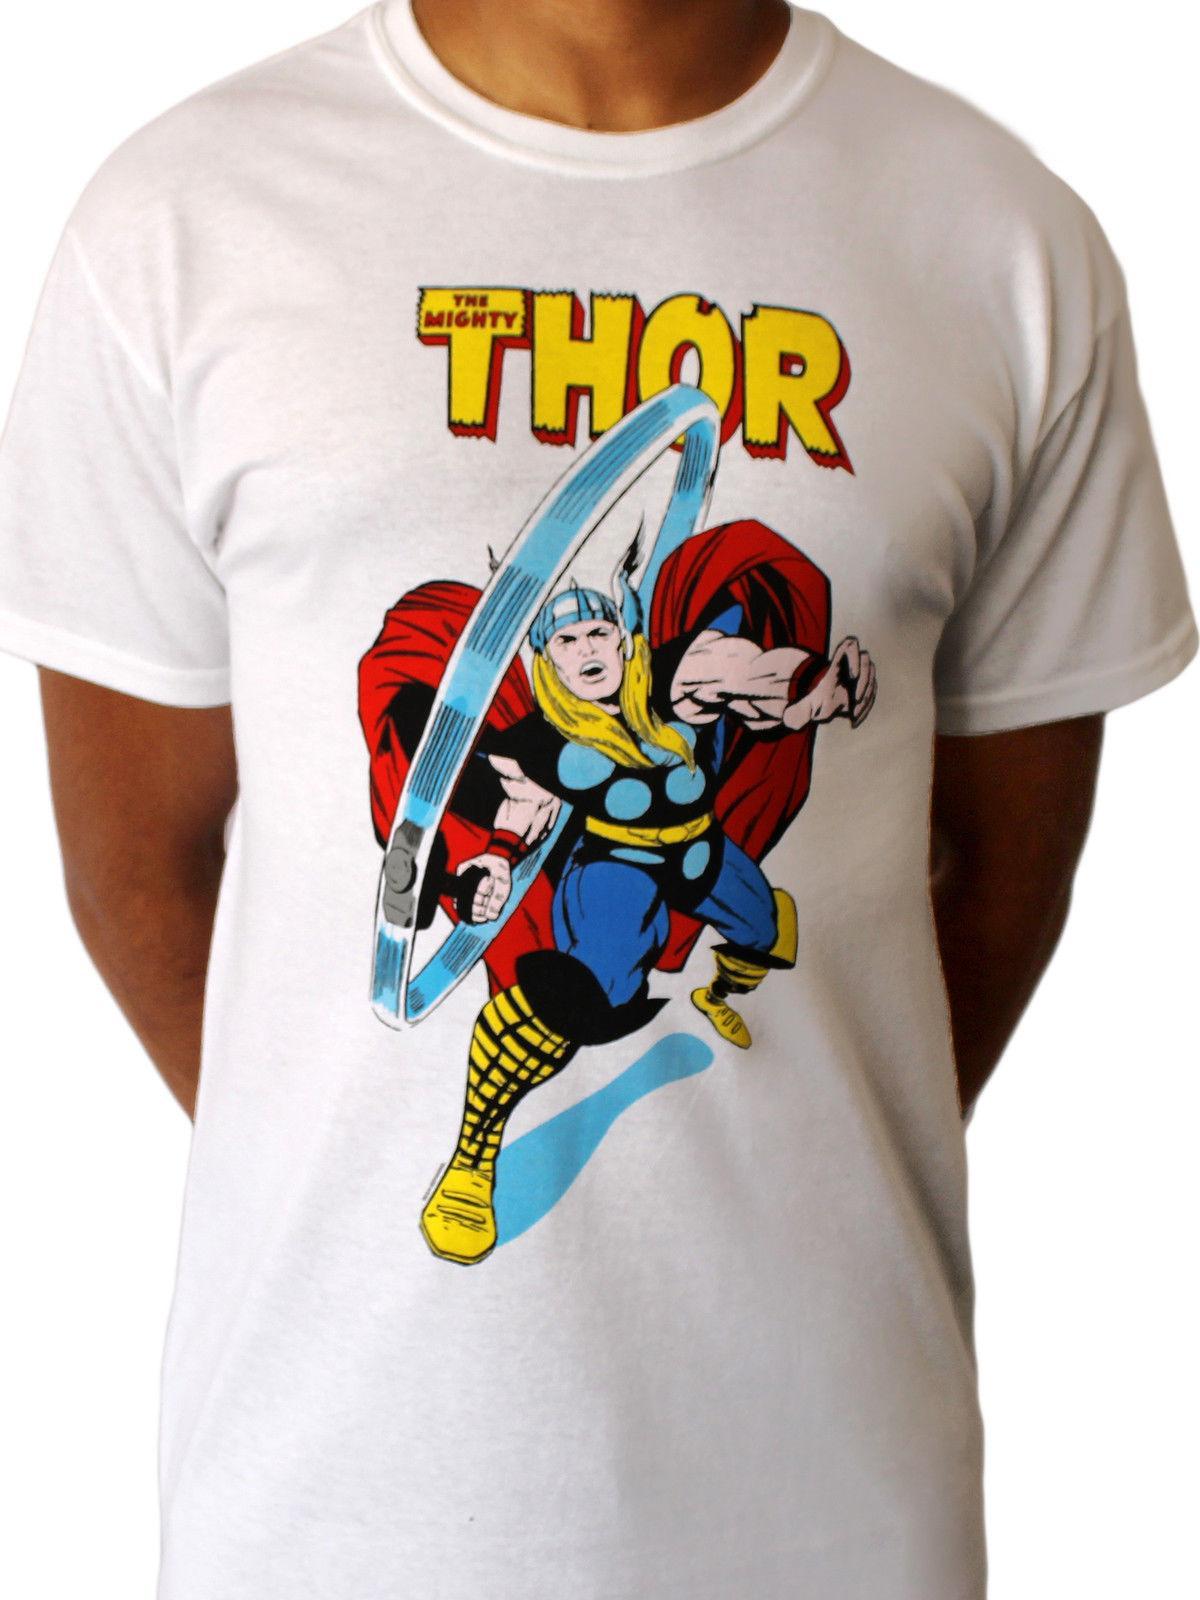 1ac85e73 Mighty Thor Hammer Marvel Comic Avengers Ragnarok Movie White Mens T Shirt  Cool Casual Pride T Shirt Men T Shirts Online White Shirt From  Designtshirts, ...